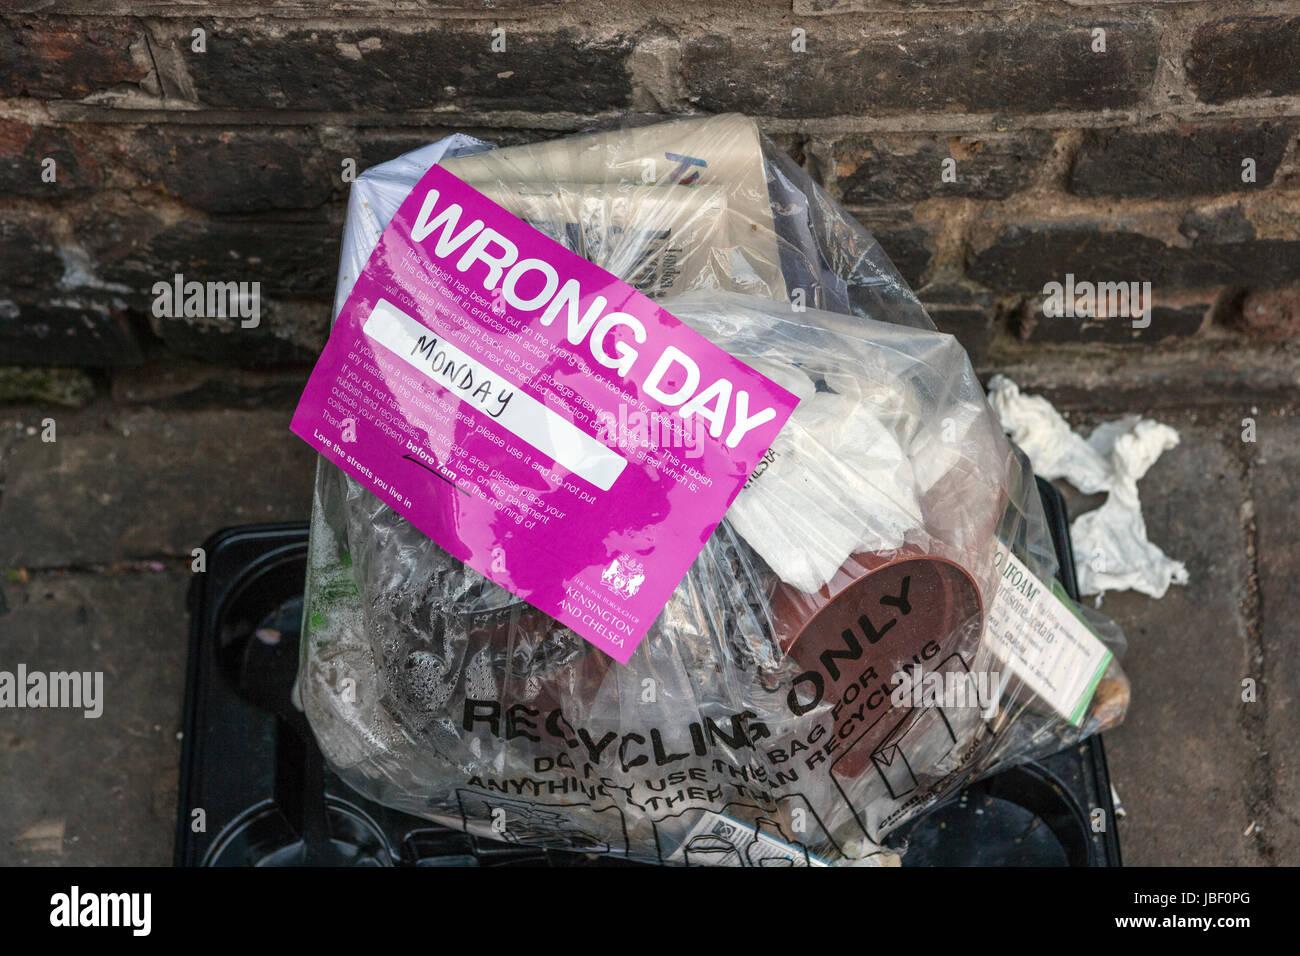 Recycling Müllbeutel mit falschen Tag Warnaufkleber, Kensington und Chelsea, London Stockbild